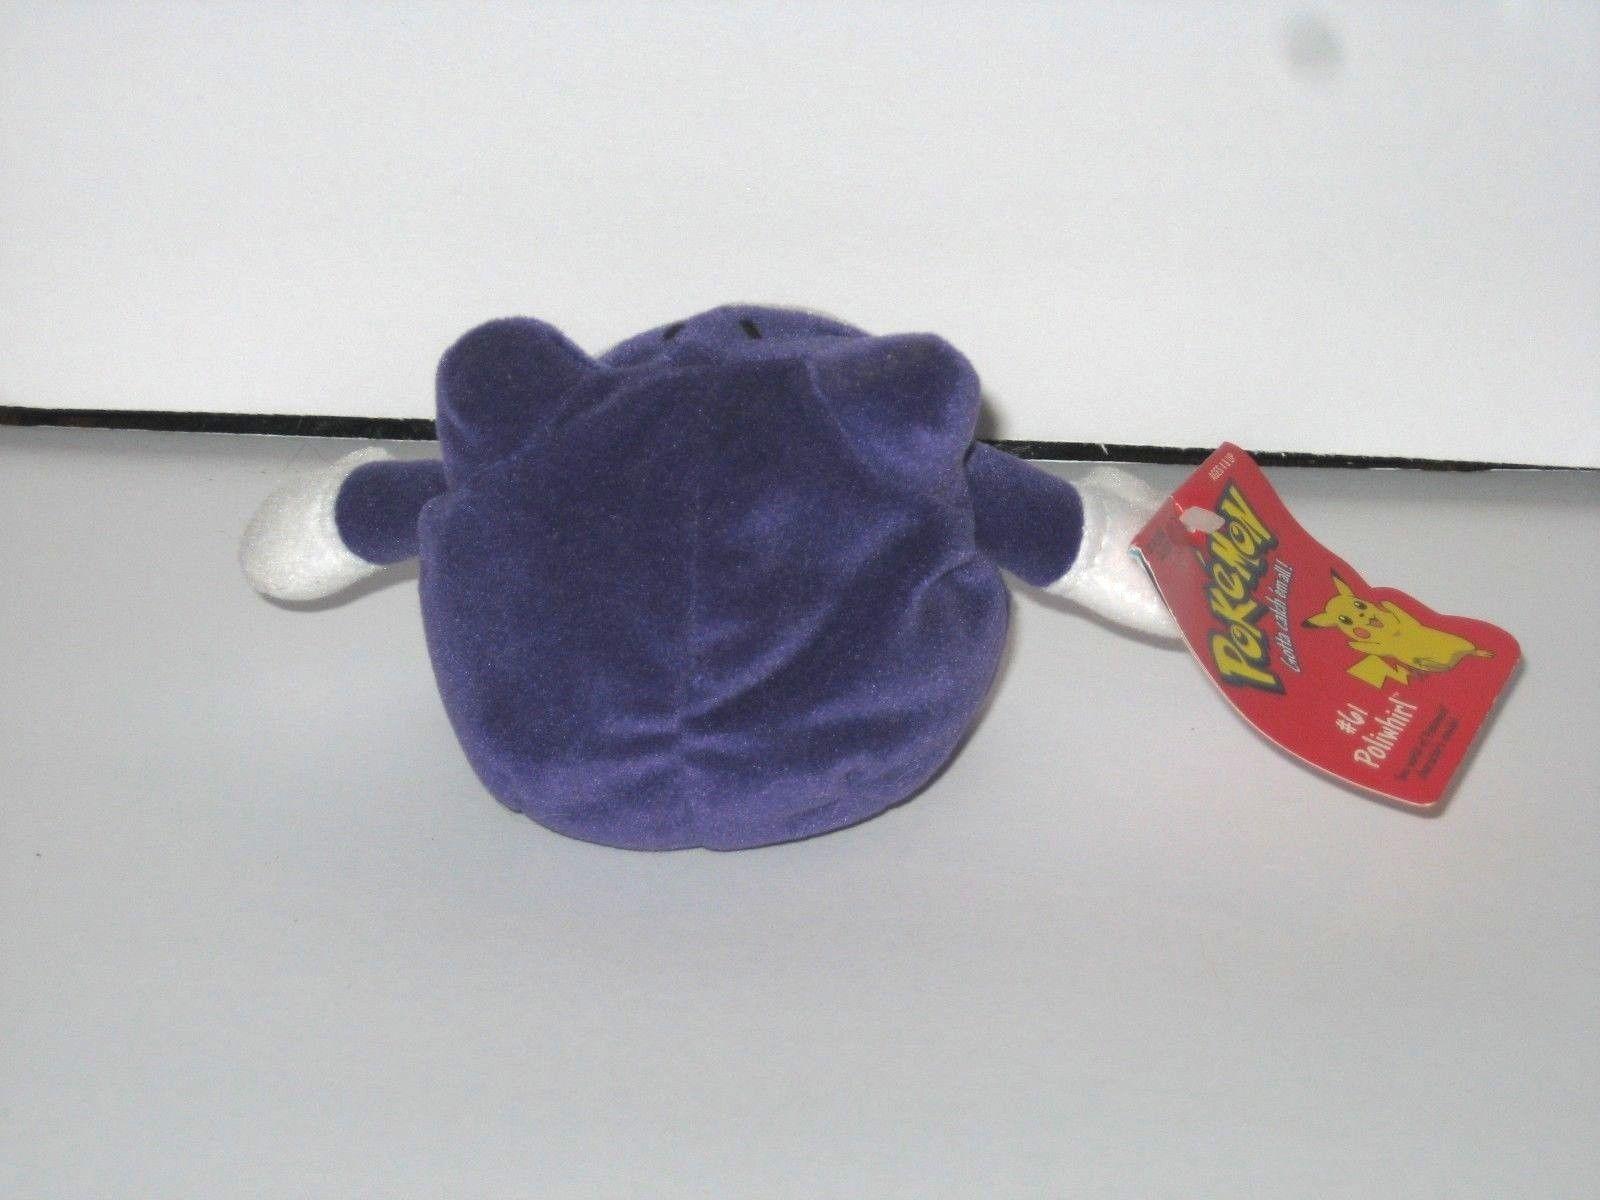 "Hasbro Pokemon Nintendo Poliwhirl Purple Whirl Plush Bean Bag #61 1998 7"" New"